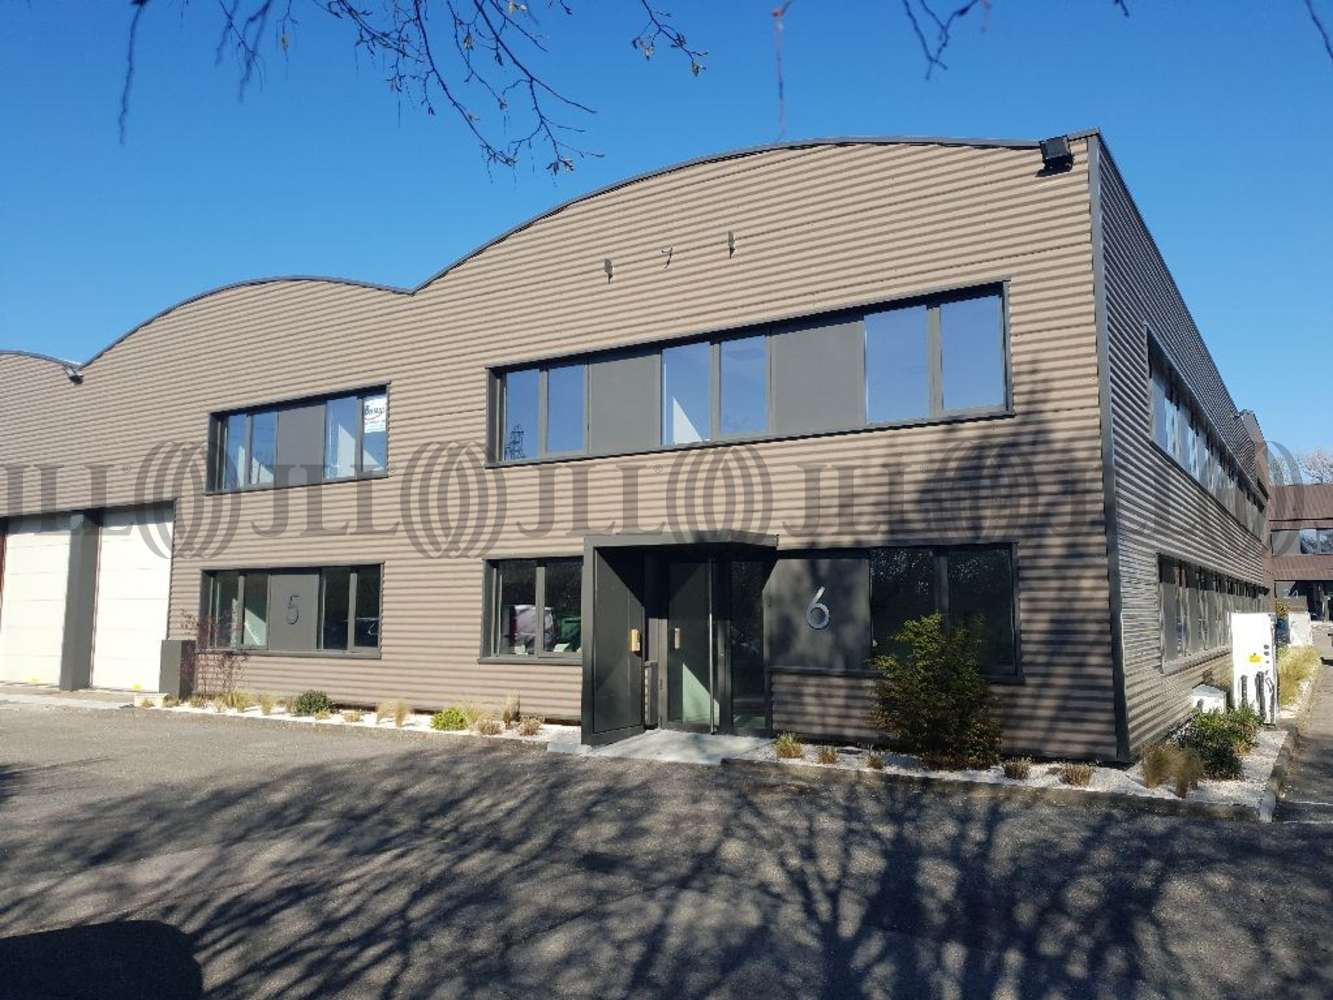 Activités/entrepôt Dardilly, 69570 - Location locaux d'activité Dardilly (69) - 10031764